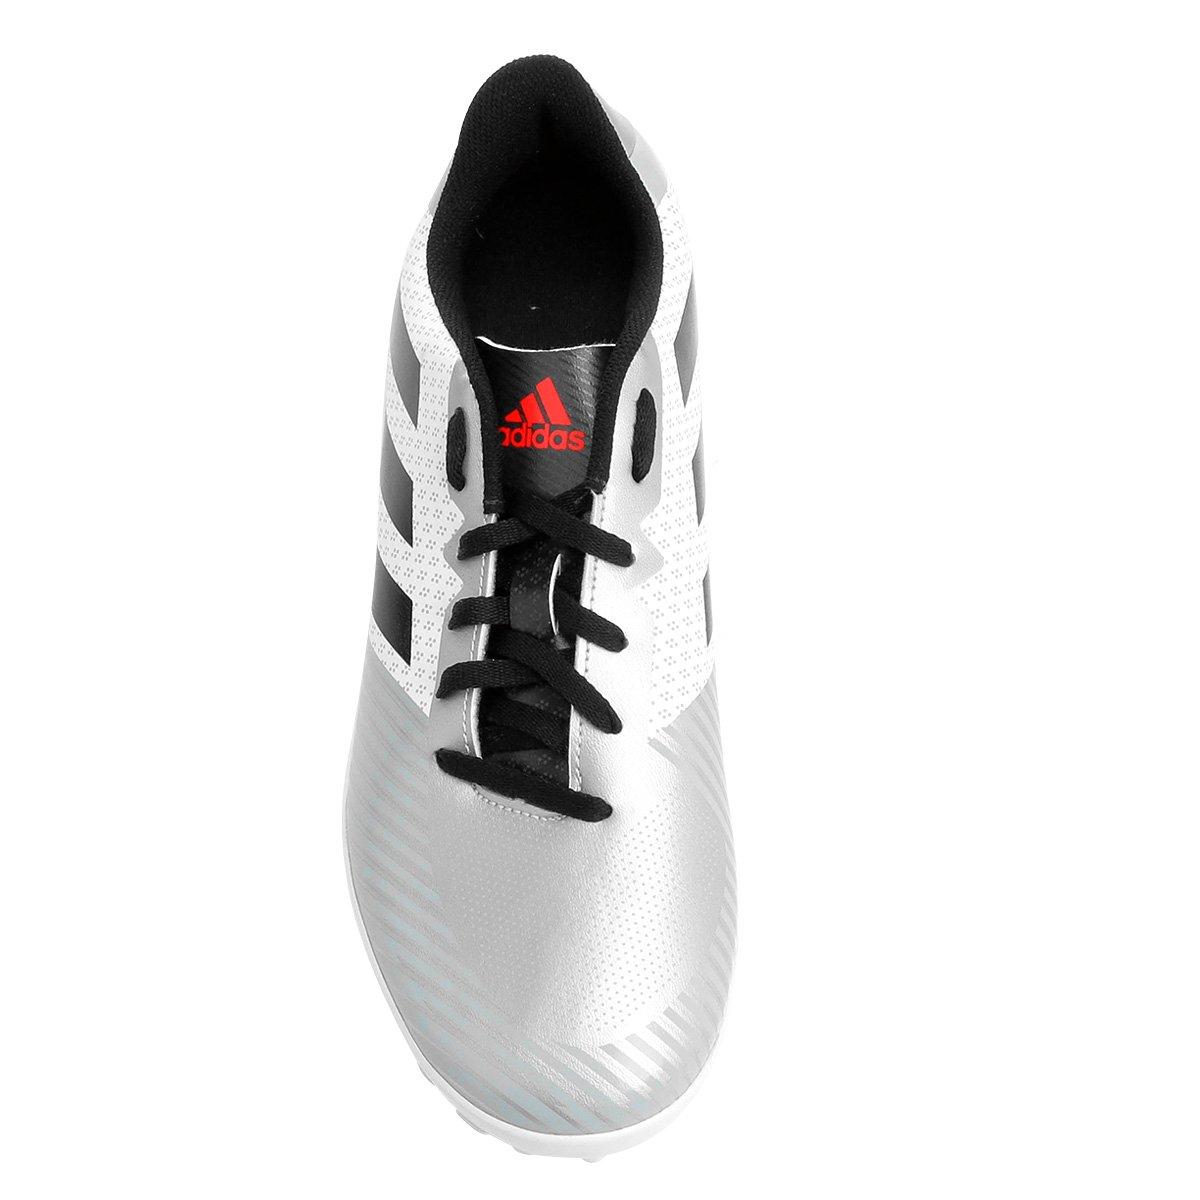 9bec2de058 Chuteira Society Adidas Artilheira 18 TF - Branco e Preto - Compre ...